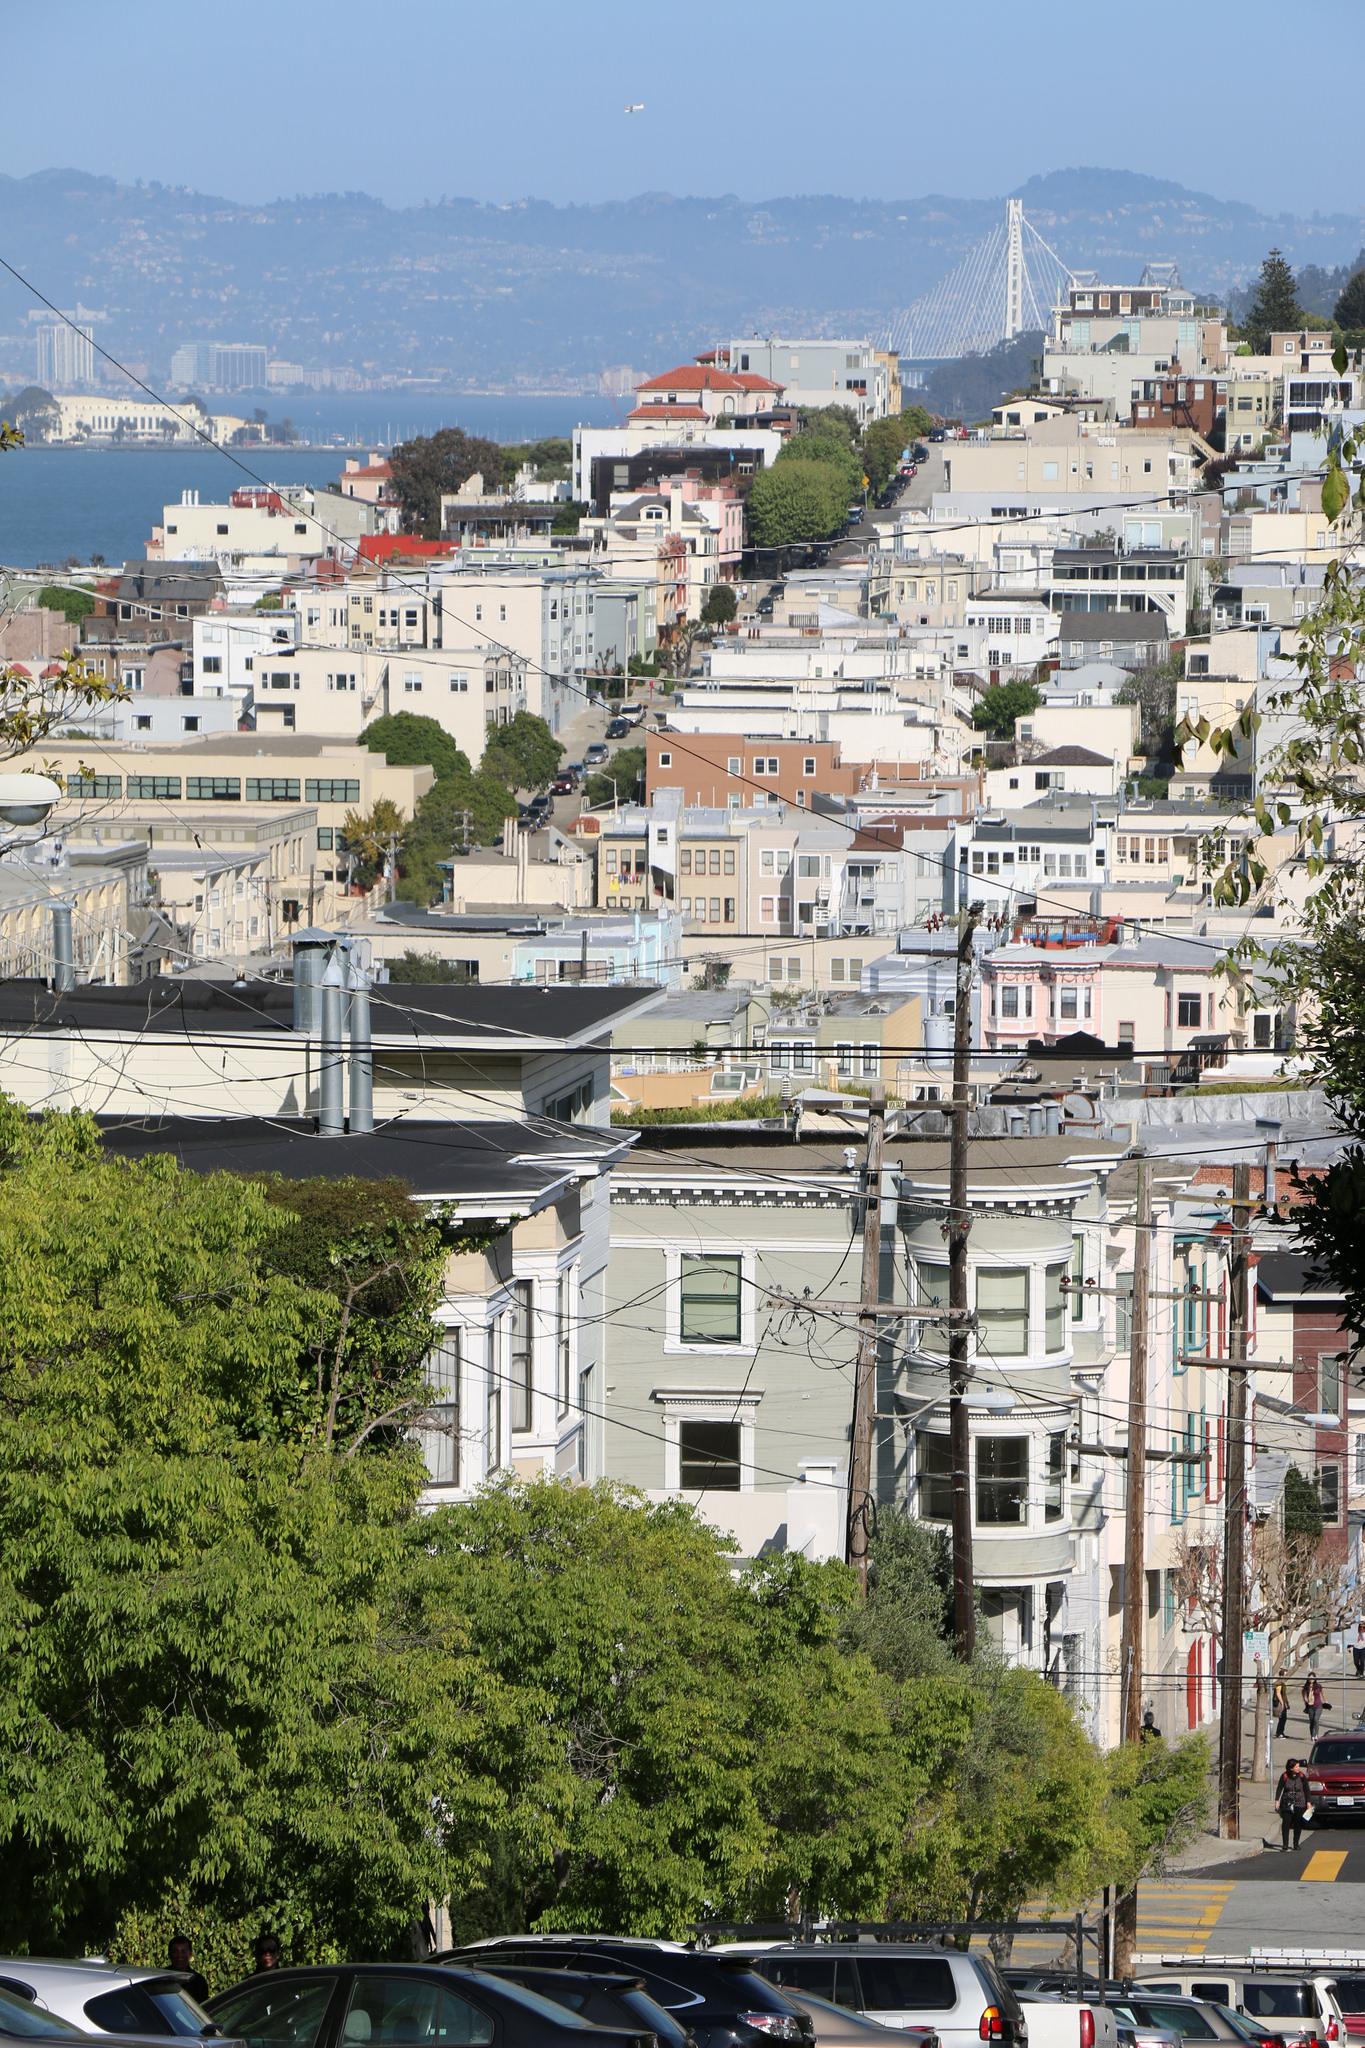 View from Lombard Street_14923219440_l.jpg